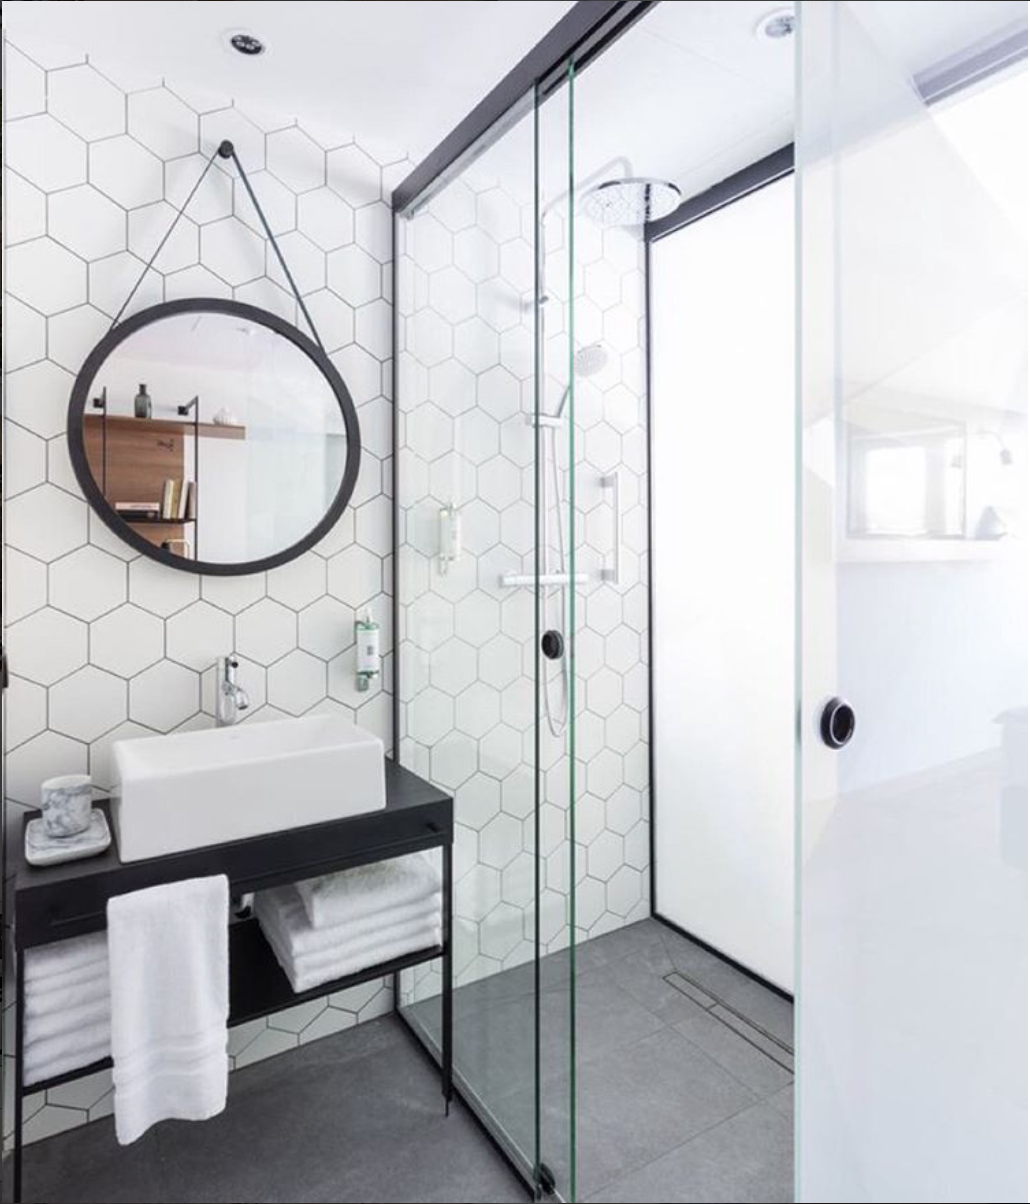 Modern Black Vanity With White Hexagon Wall Tile In Bathroom.